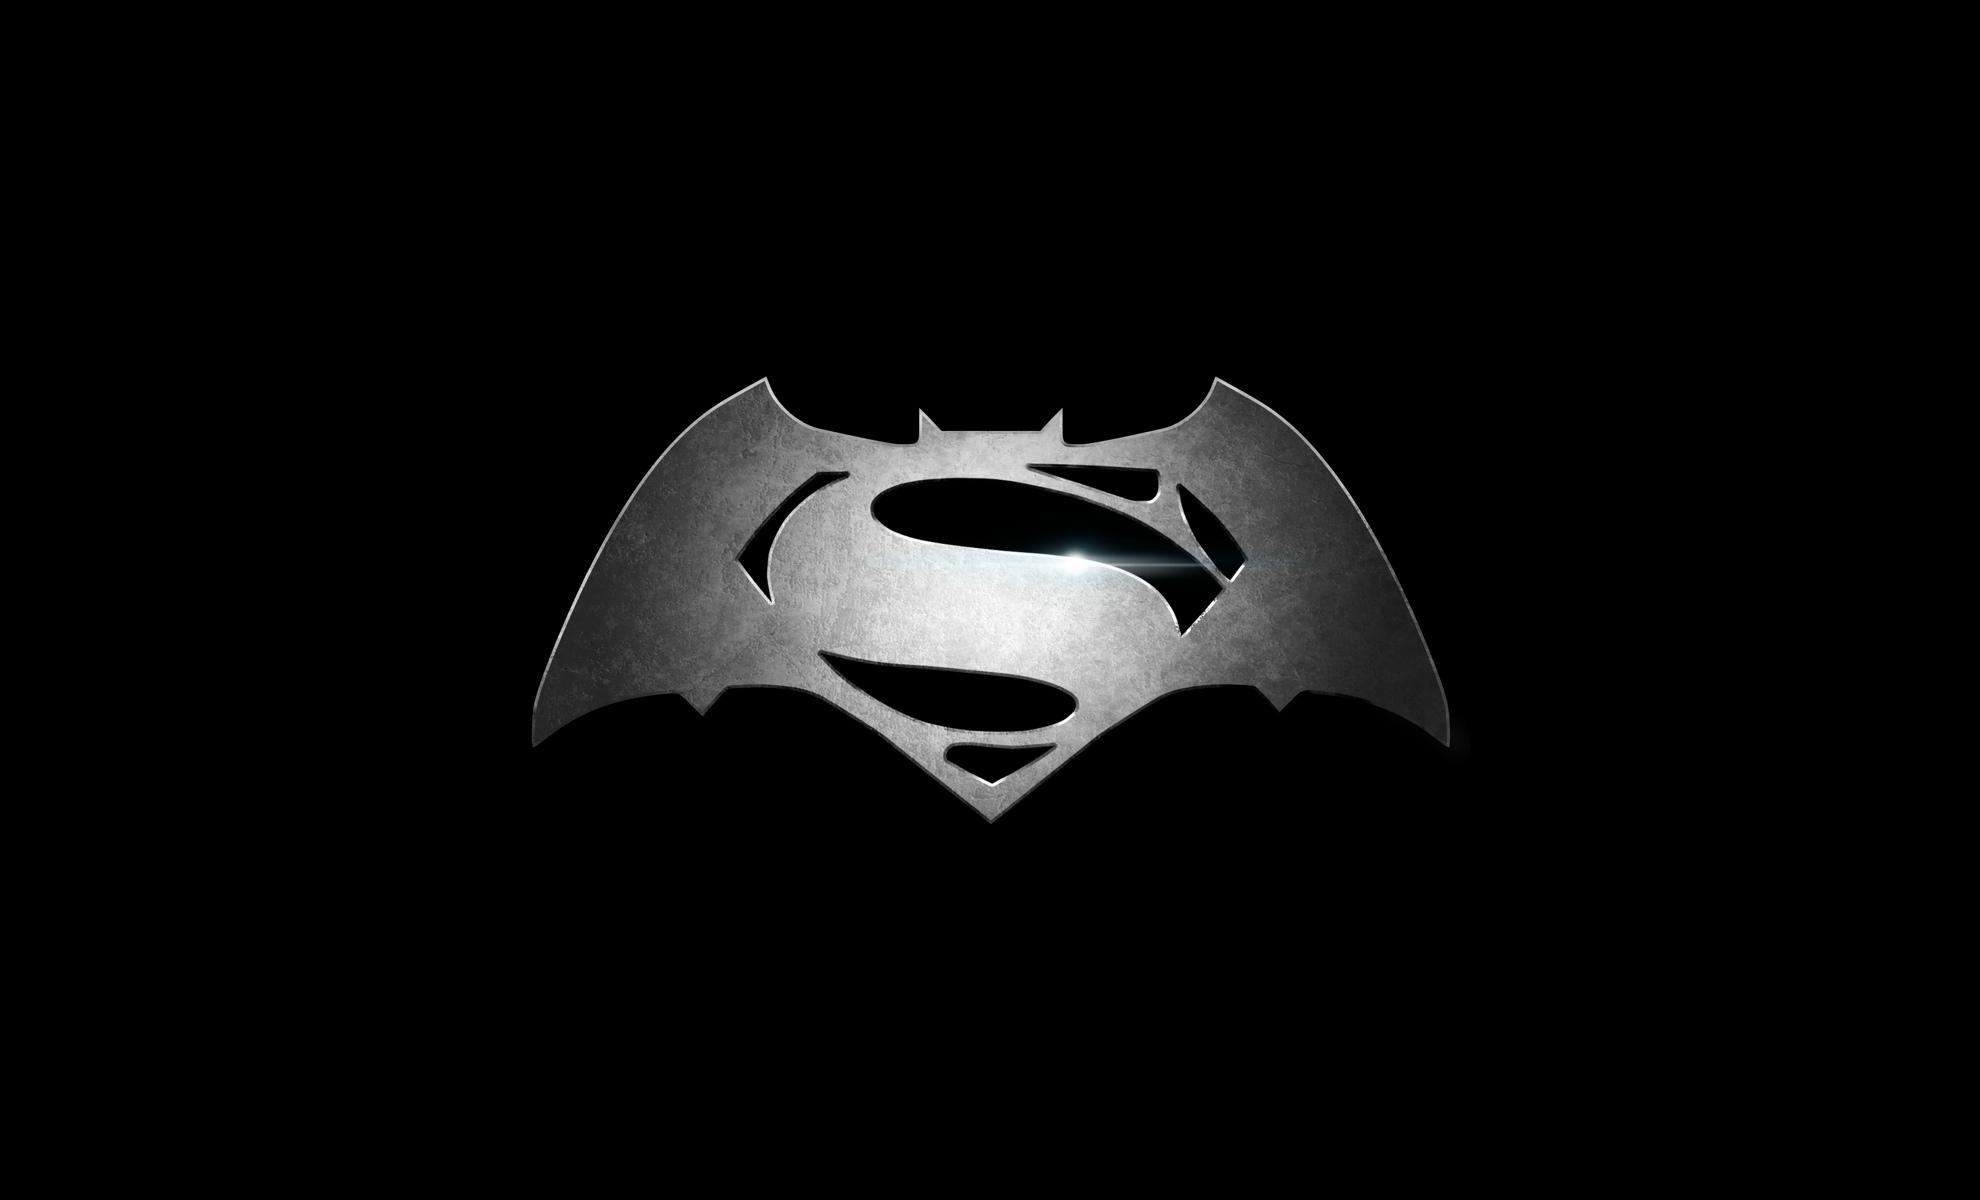 Batman V Superman Dawn Of Justice Wallpaper Latest Photos 8kzk1ey6 1980x1200